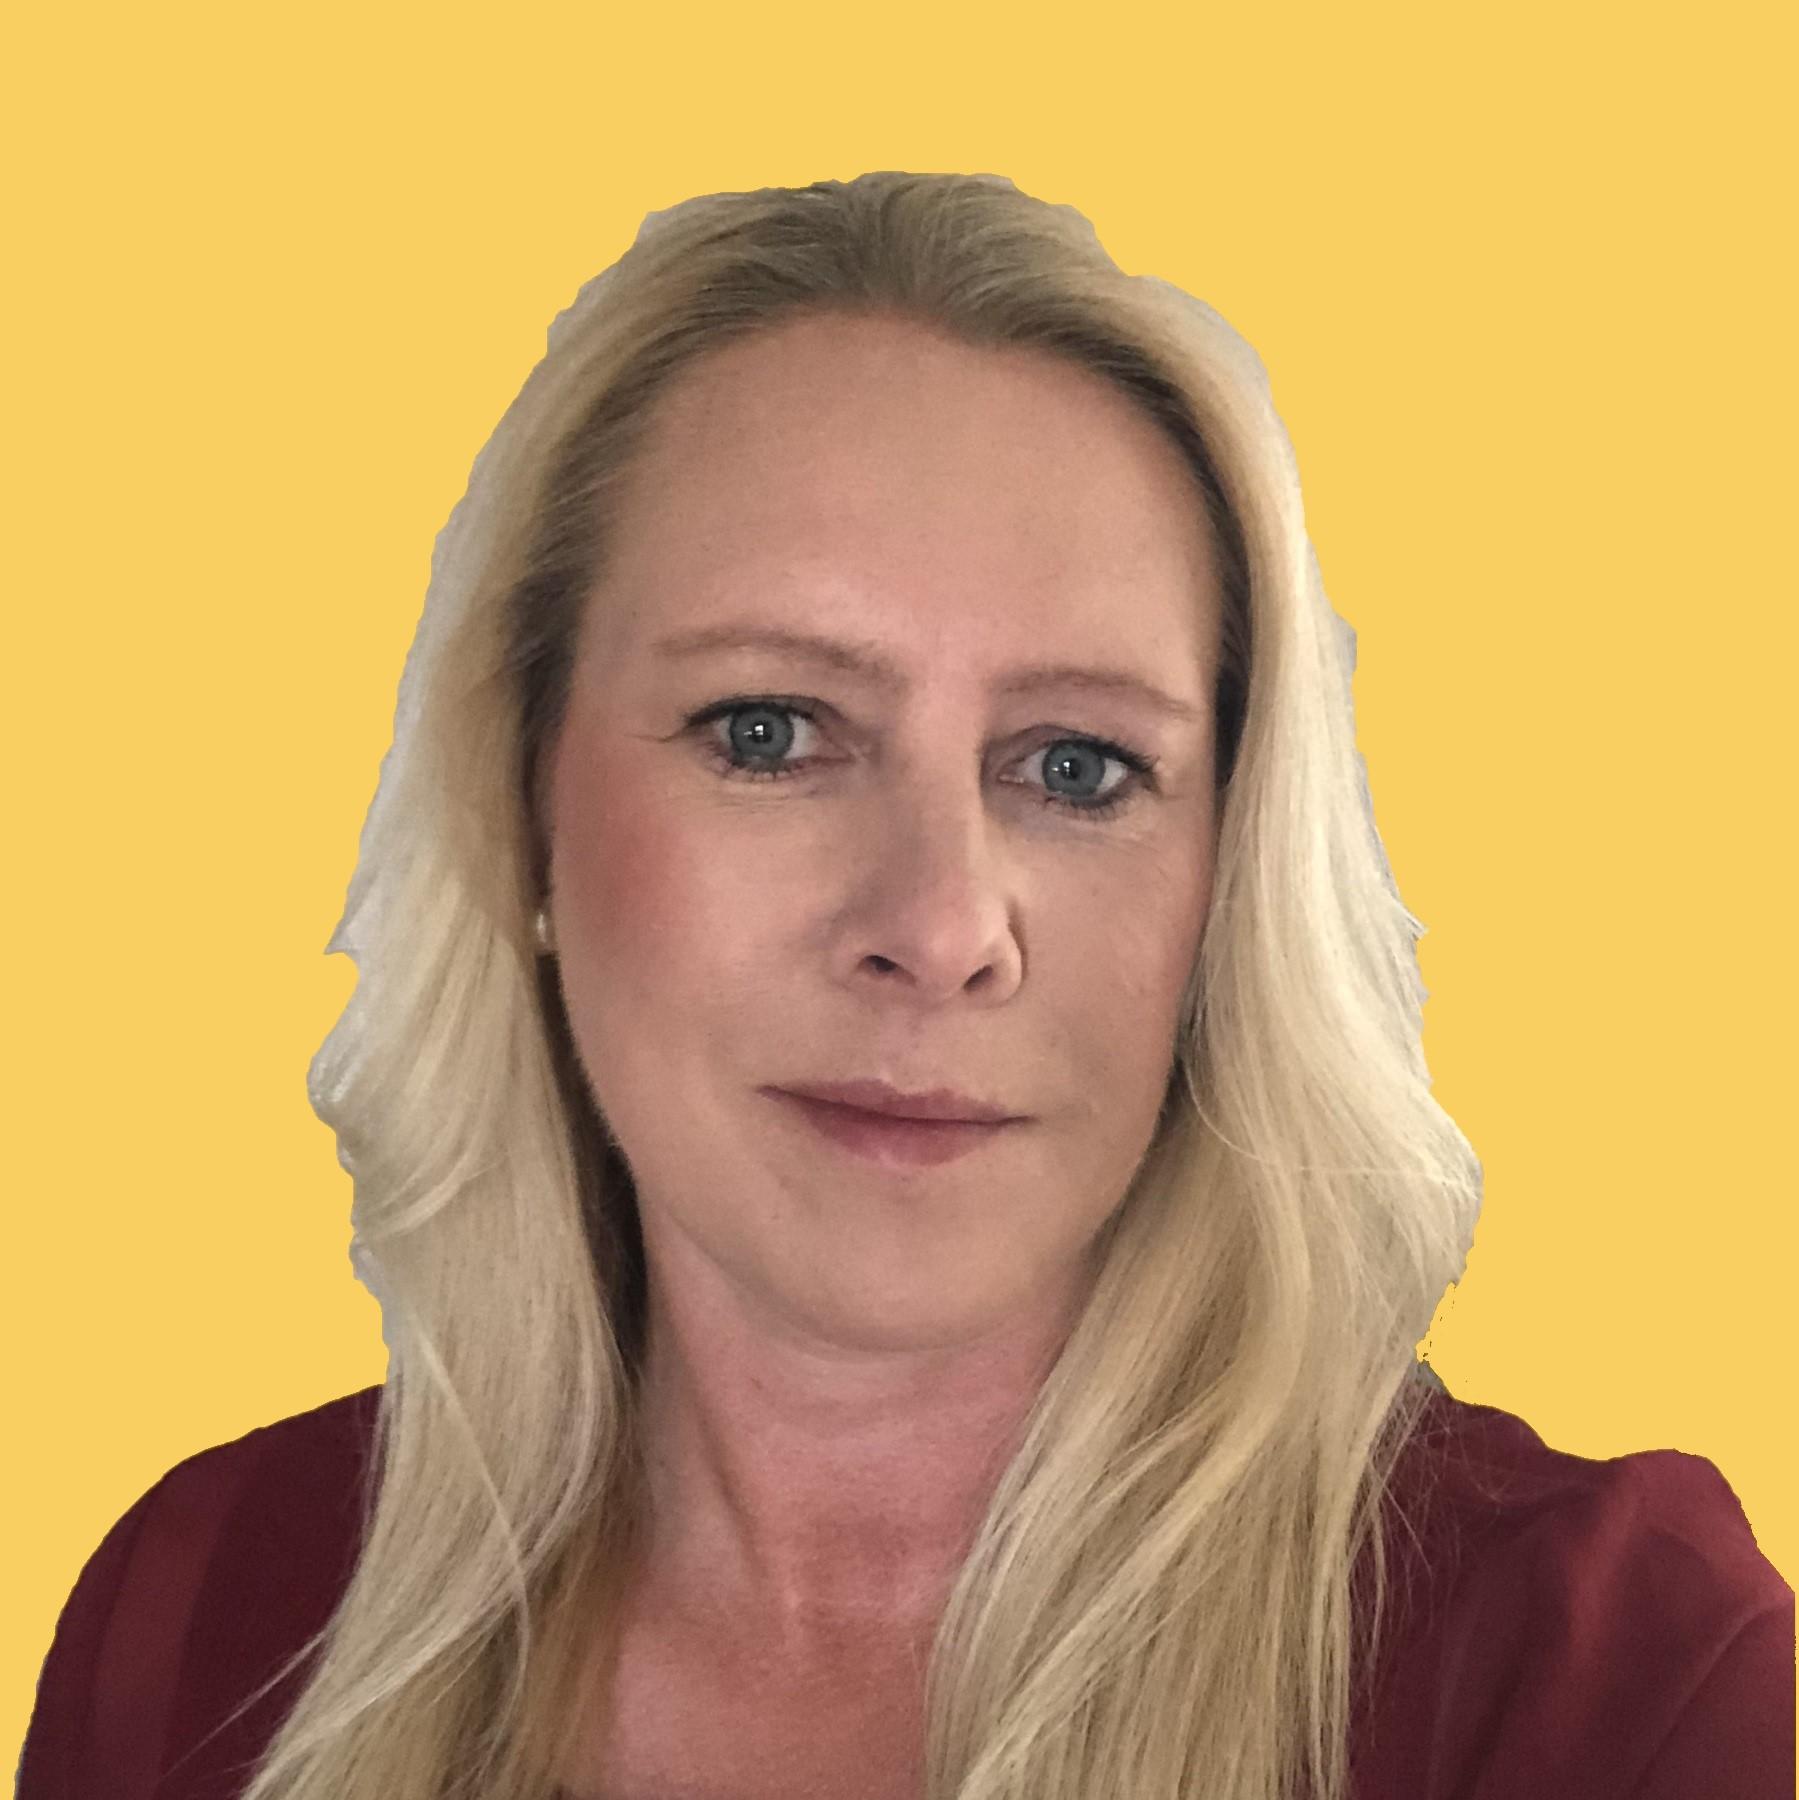 Caroline Olofsson EnRival Halmstad Halland Småland